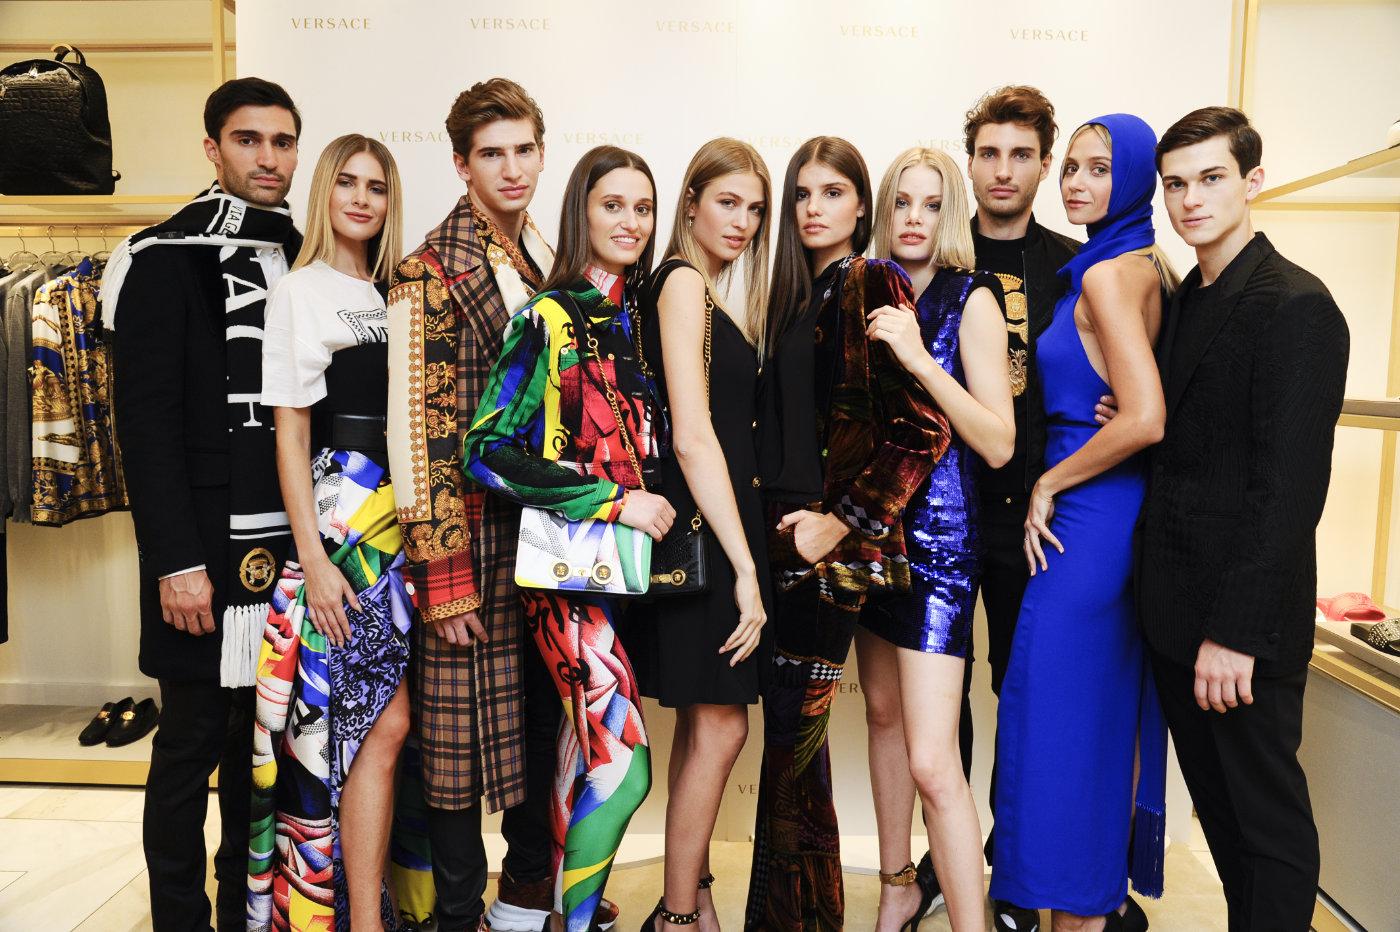 Gruppenfoto Versace Kollektion